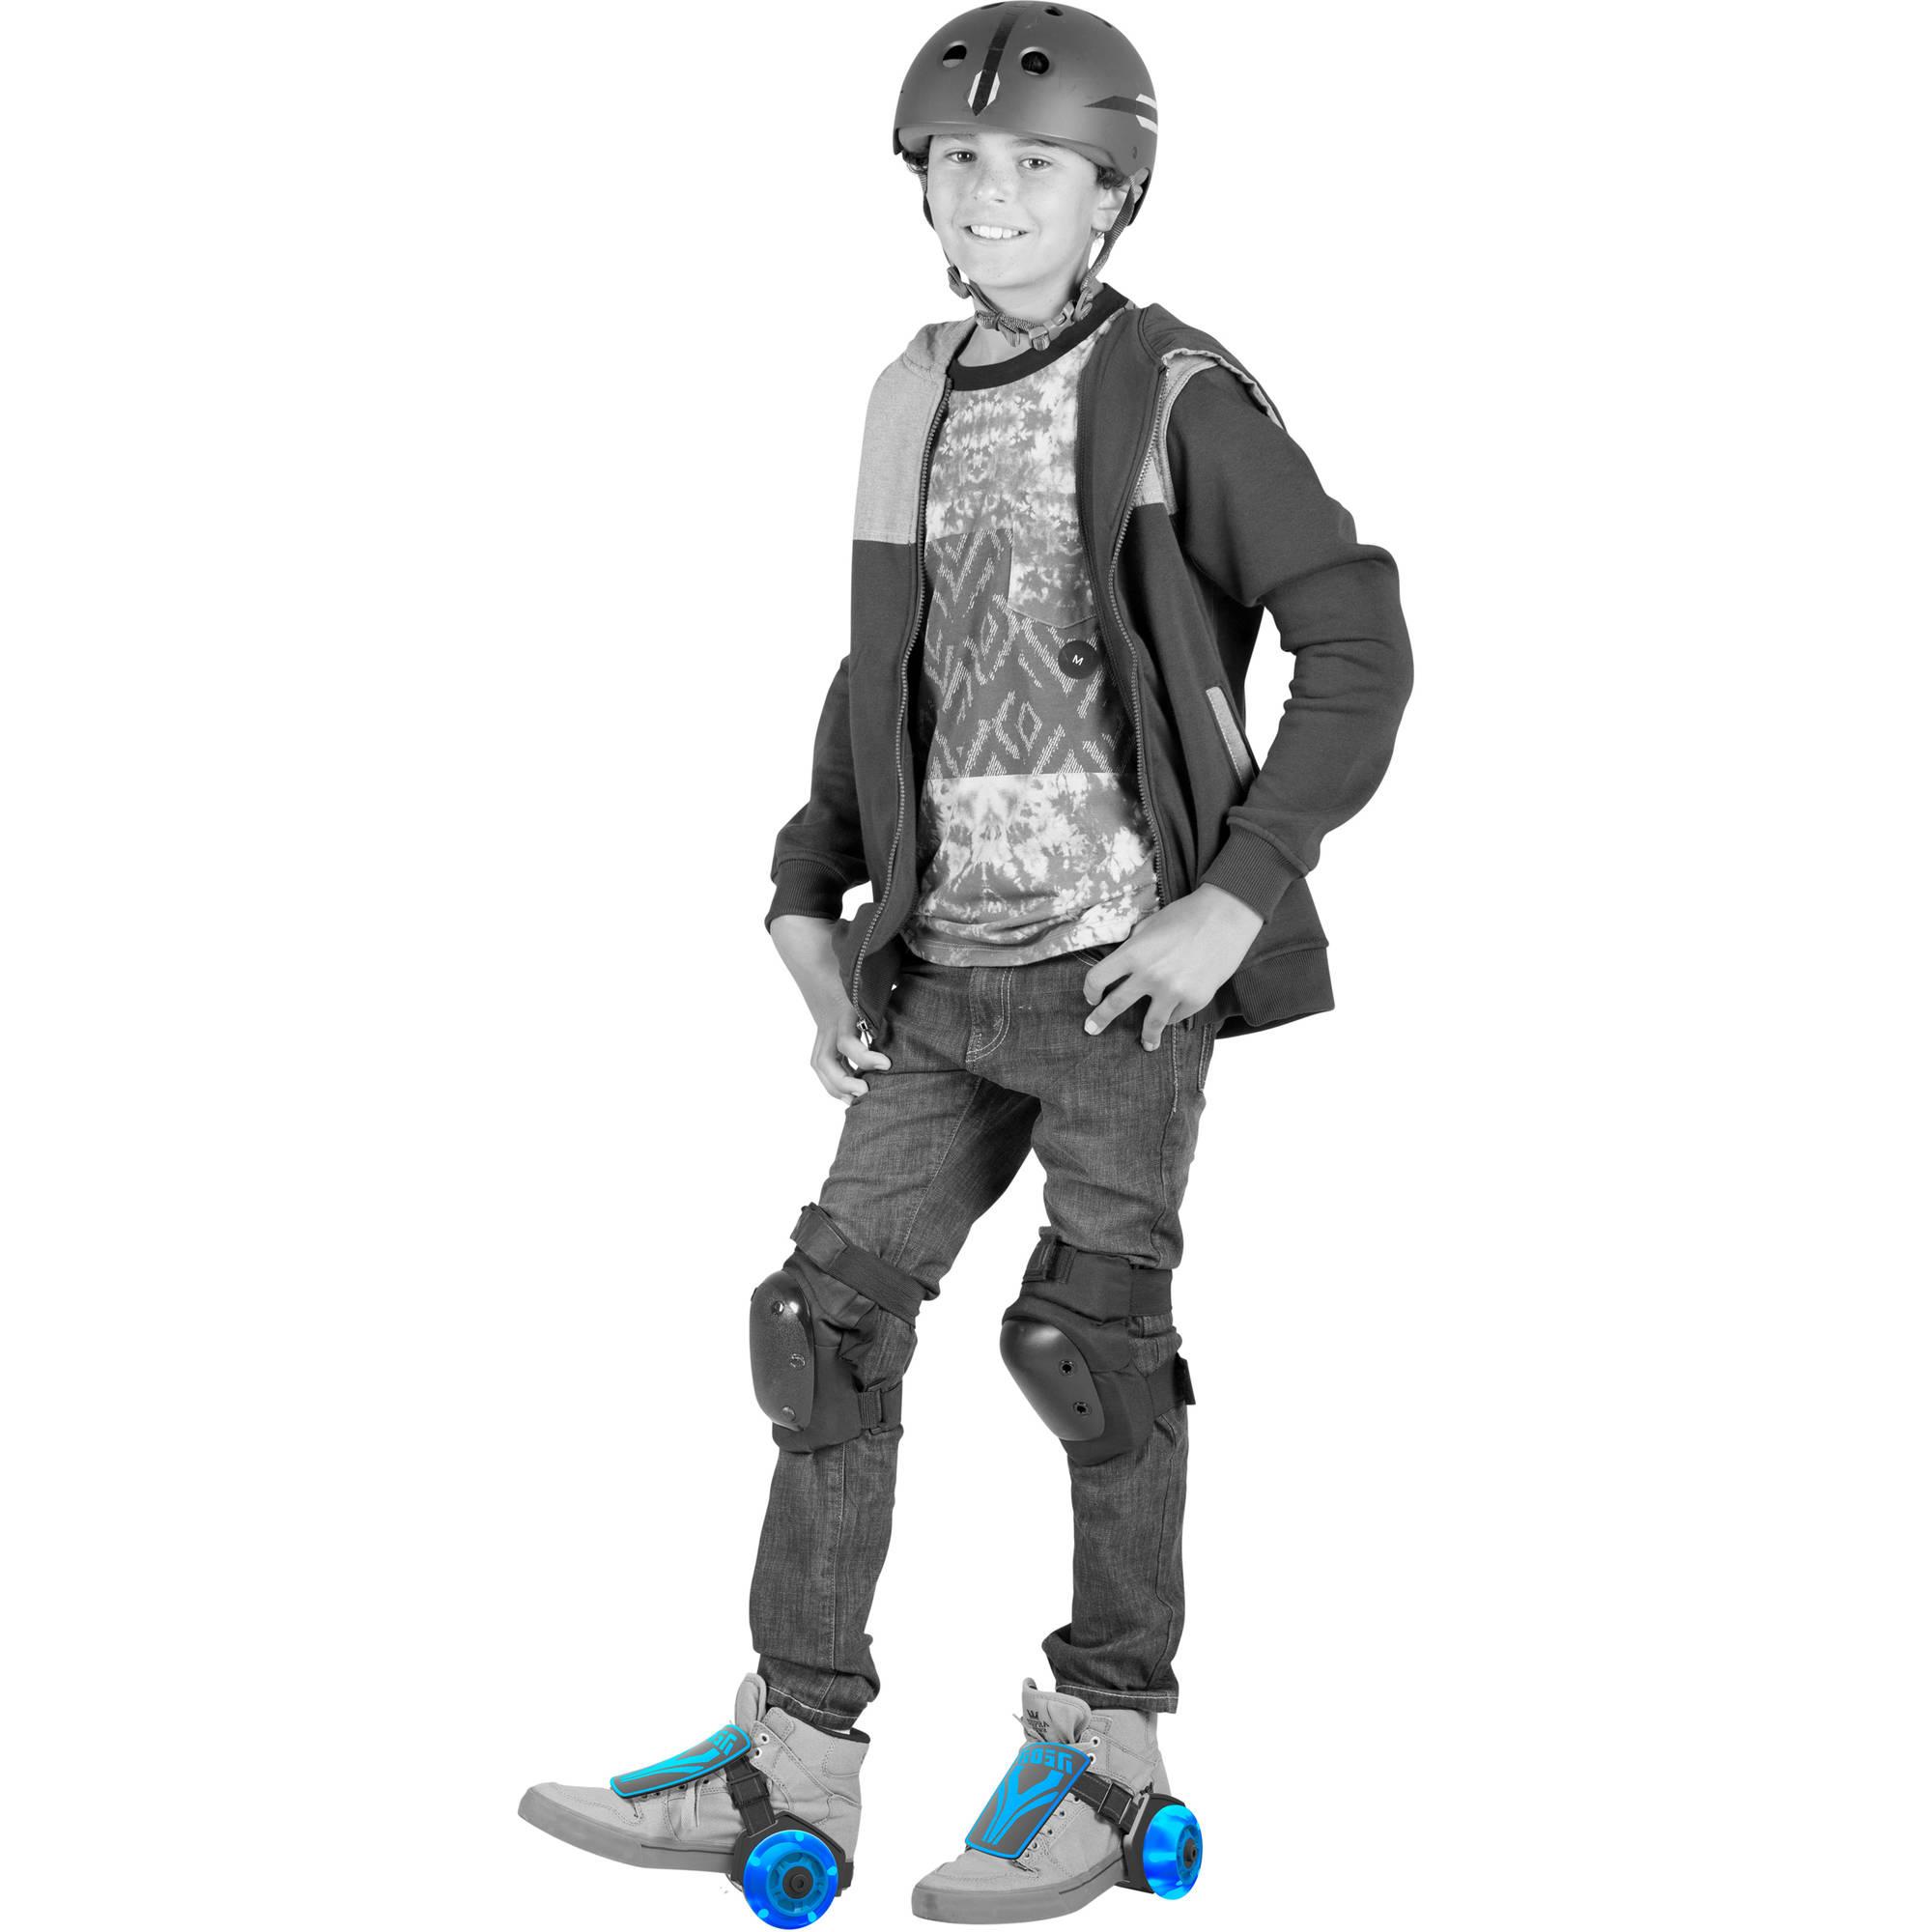 Roller shoes walmart - Roller Shoes Walmart 59